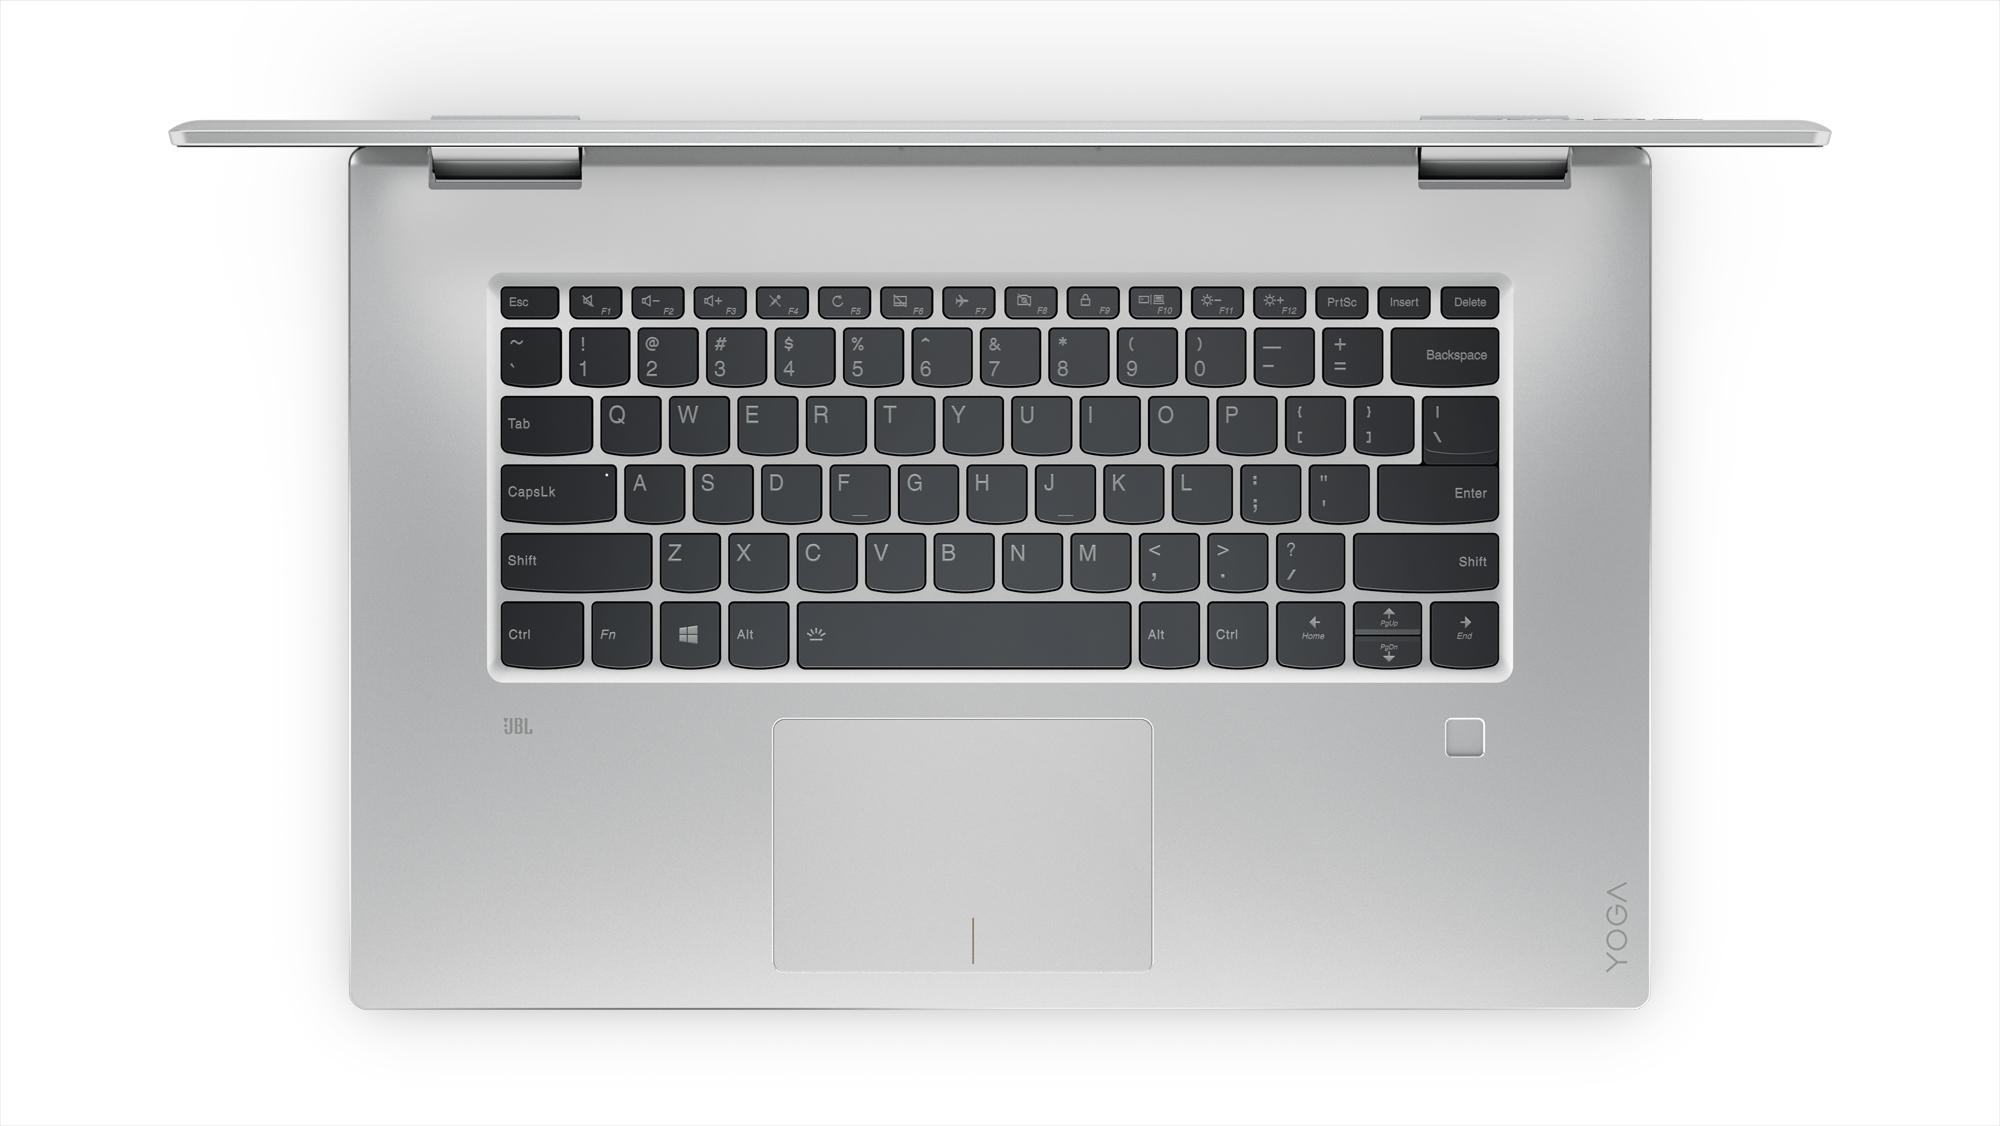 Фото  Ультрабук Lenovo Yoga 720-15IKB Platinum (80X700B5RU)